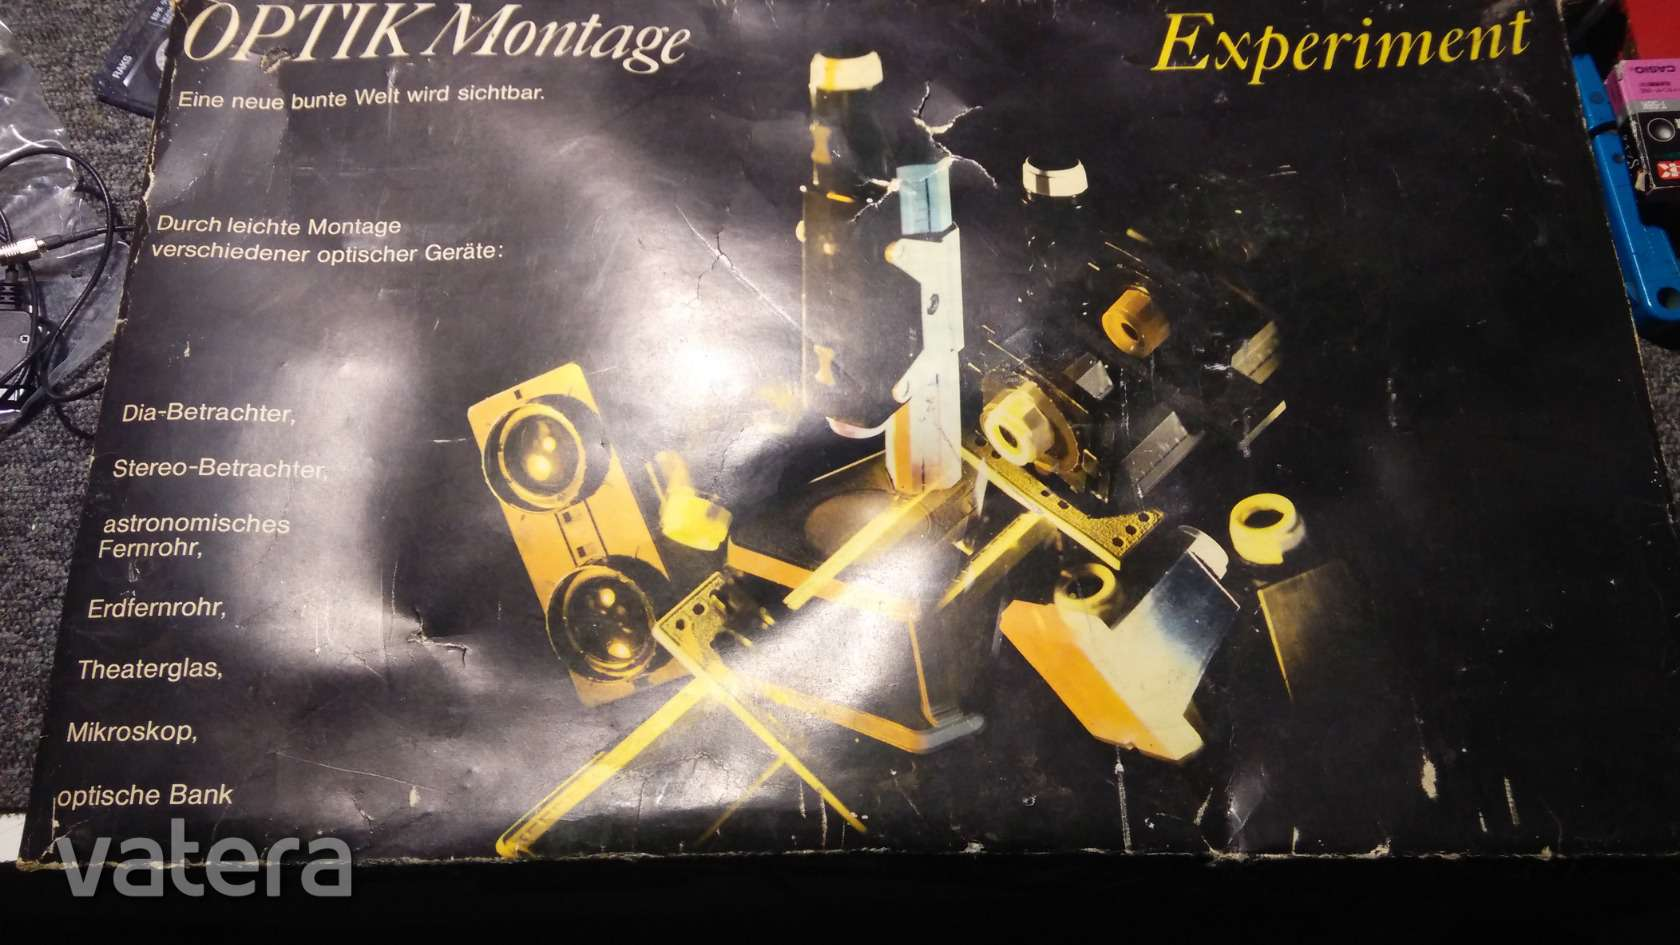 optik-montage-experiment-optikai-epitokeszlet-retro-jatek-f85a_3_big.jpg